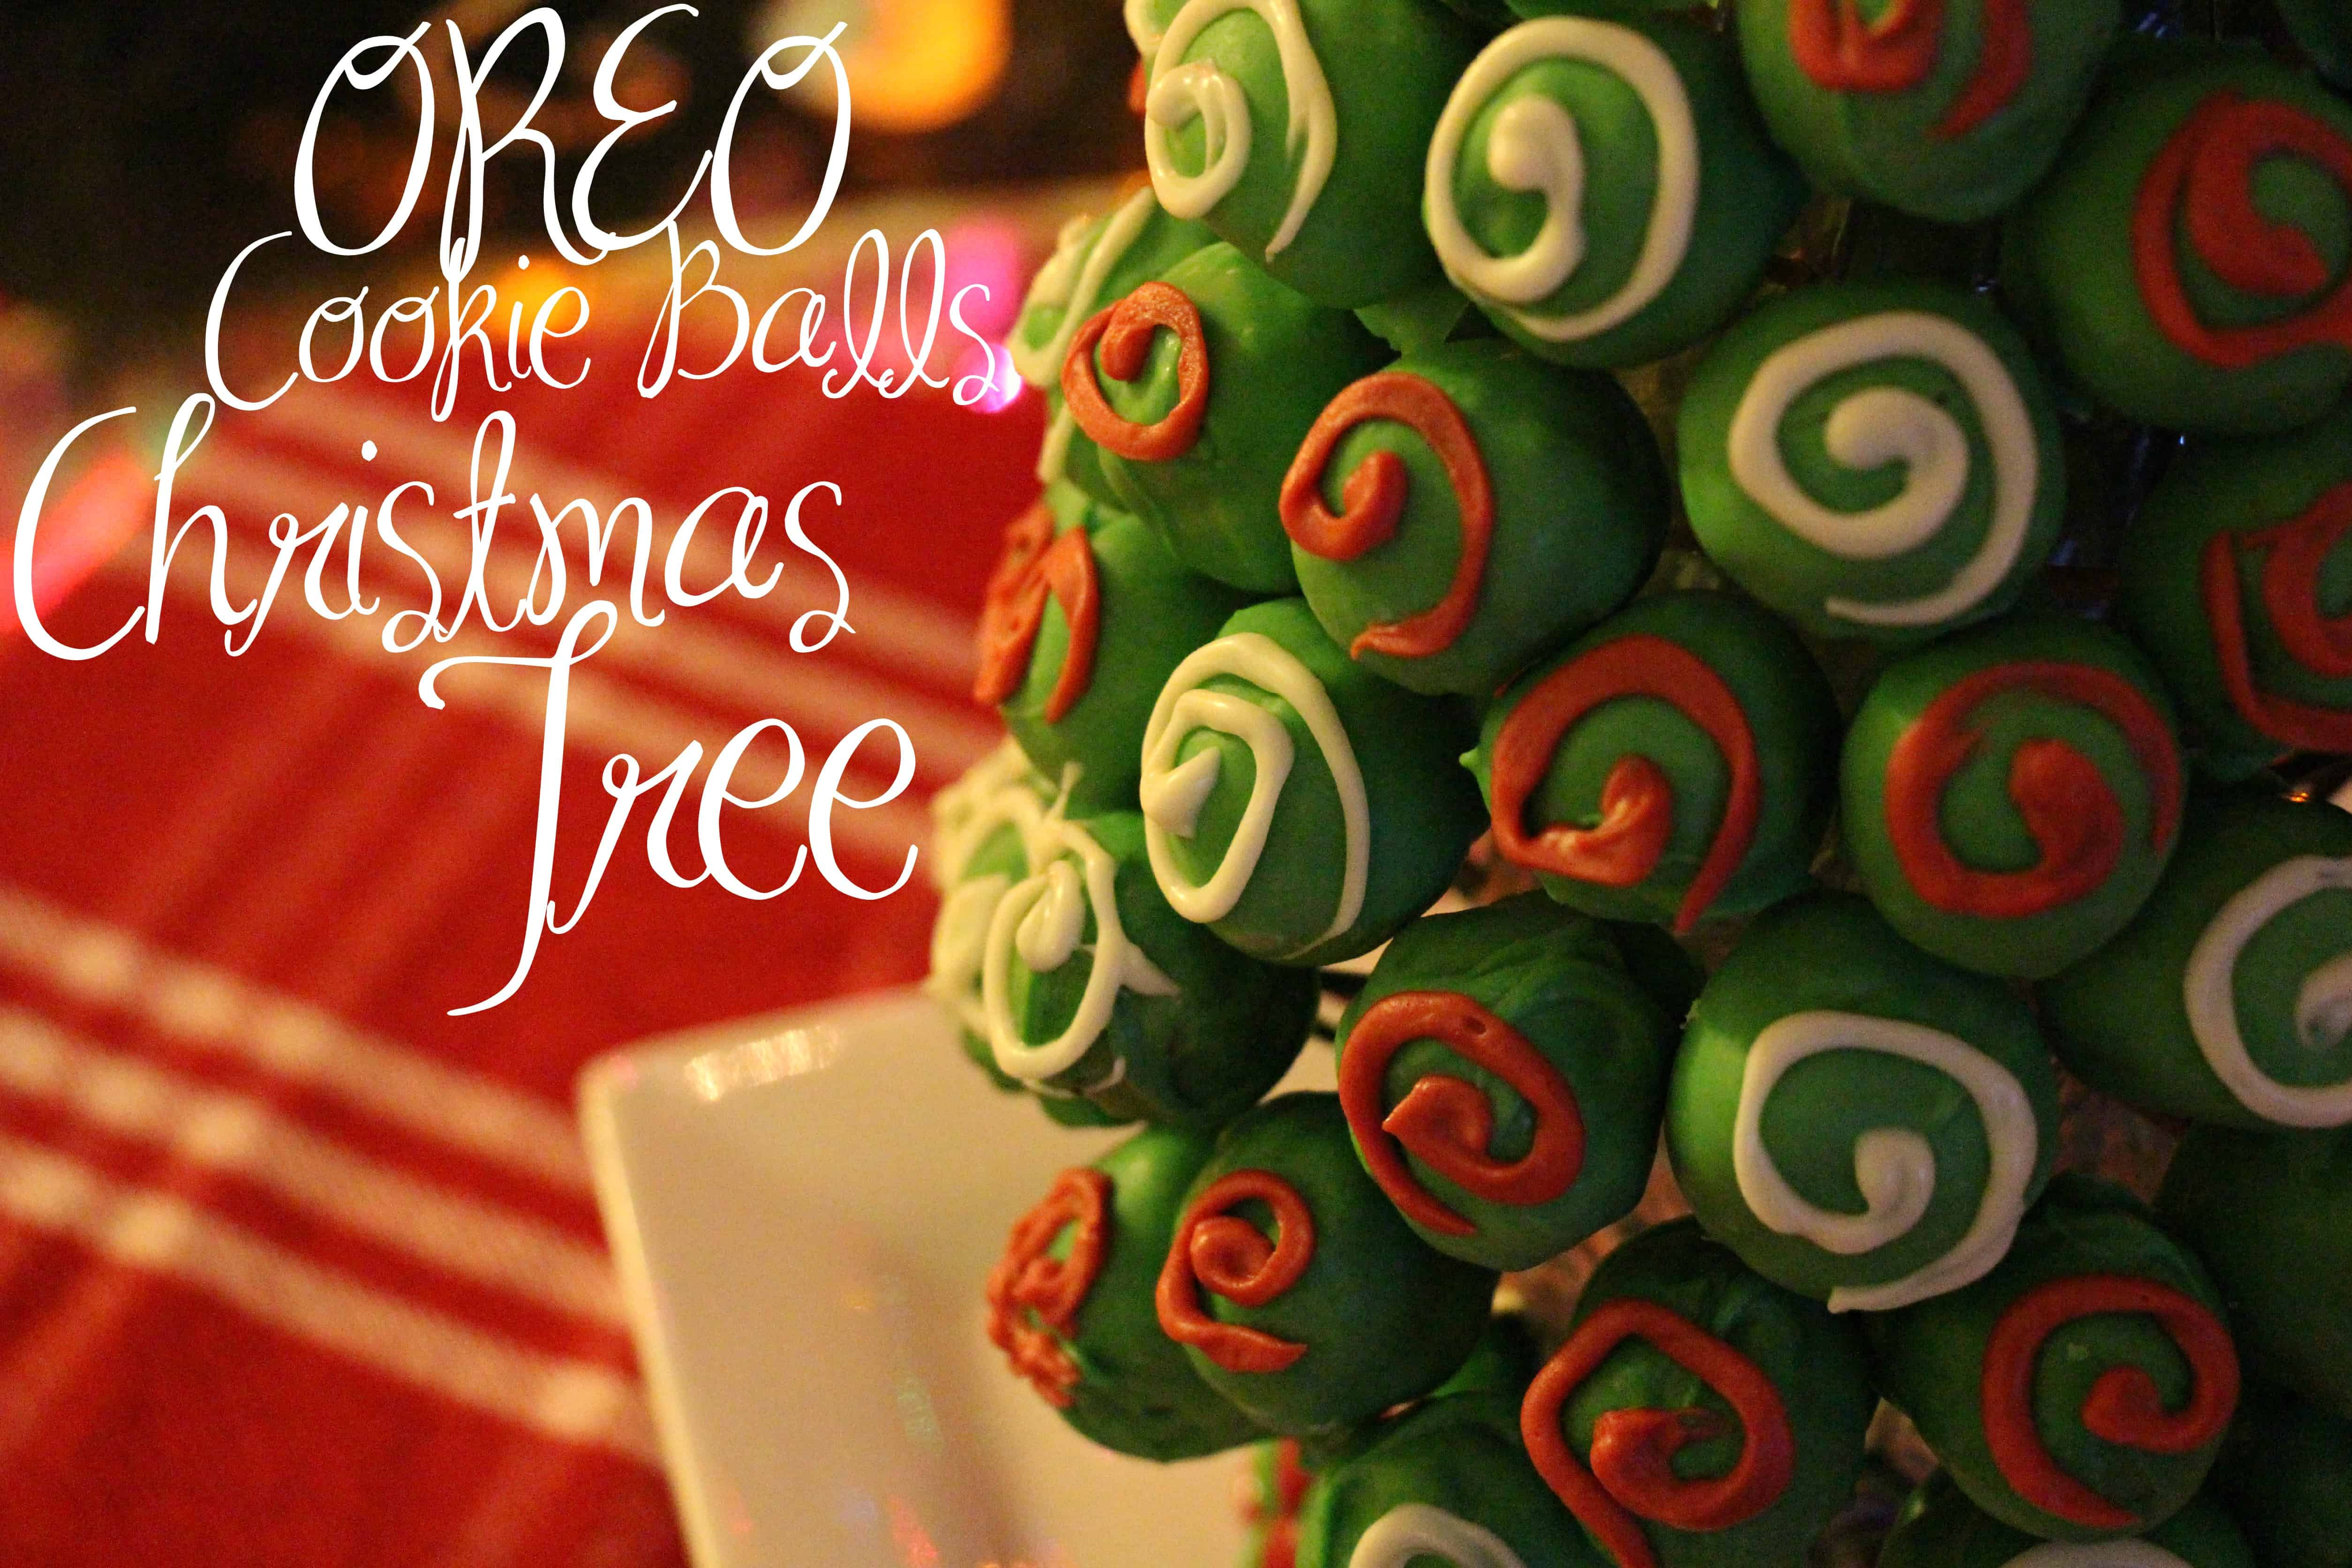 OREO-Cookie-Balls-Christmas-Tree-14